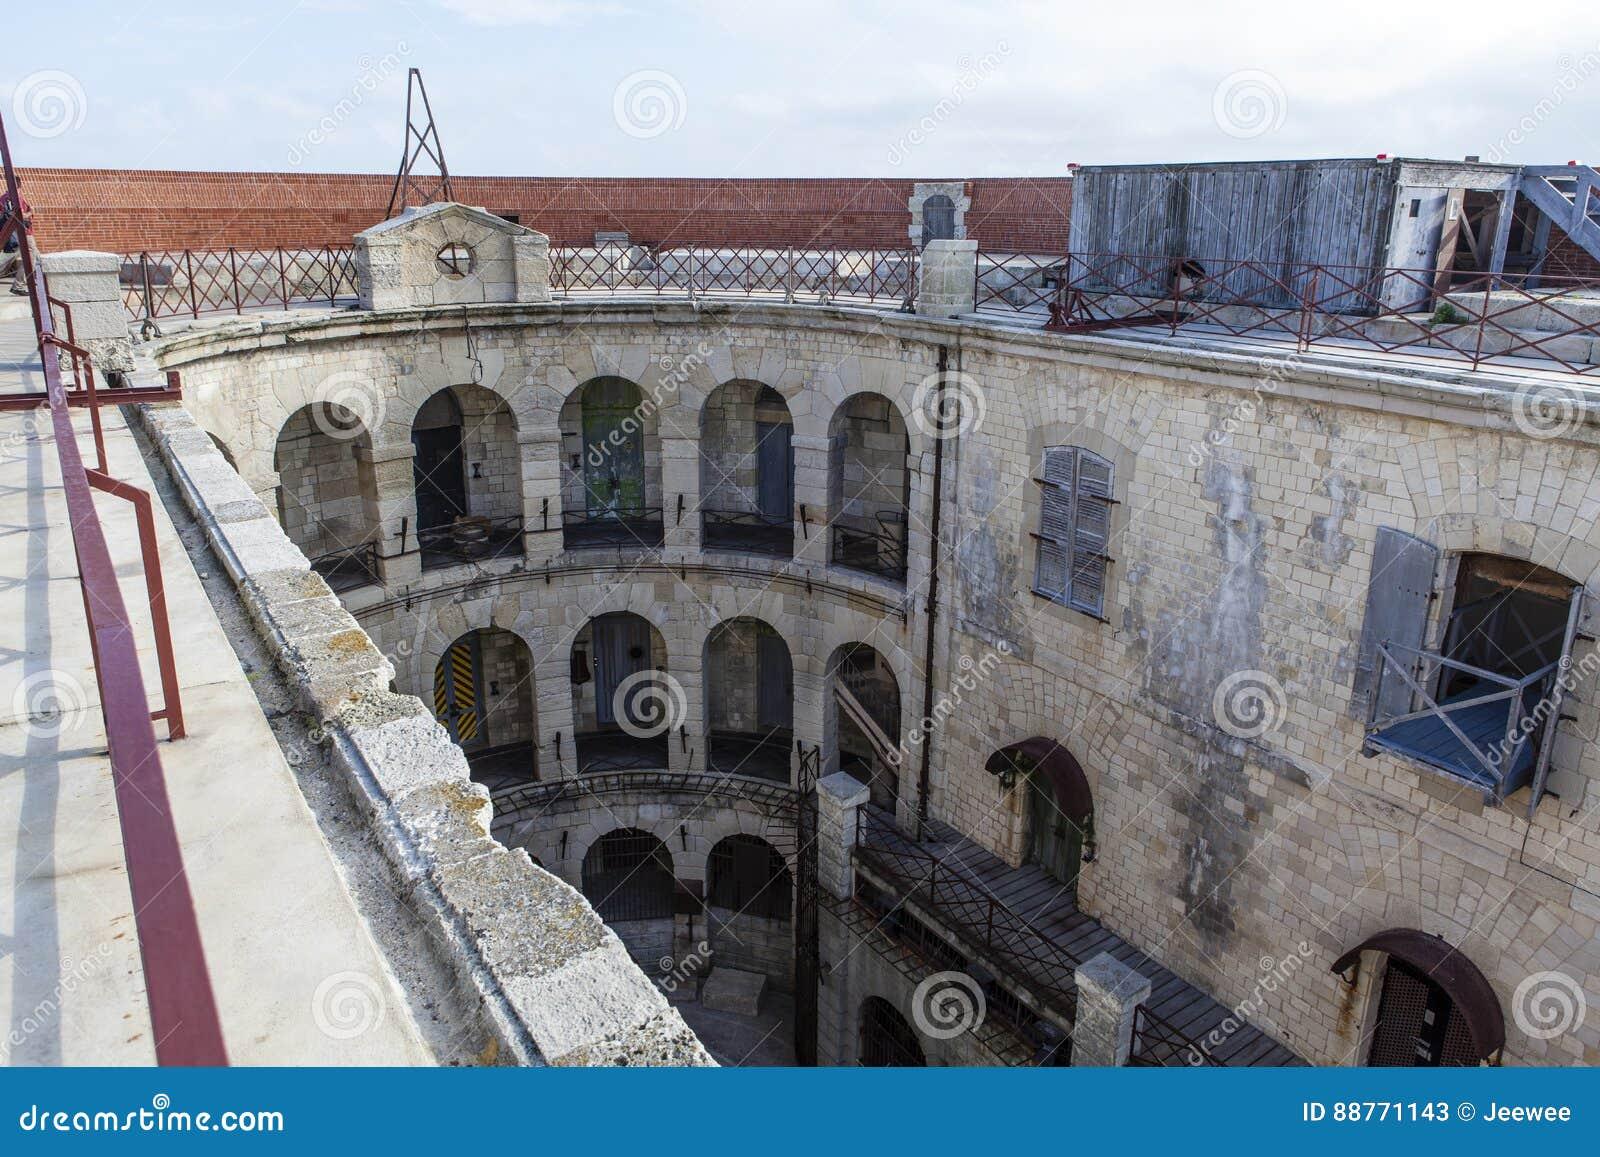 Interior Of Fort Boyard In France, Charente-Maritime, France Stock ...